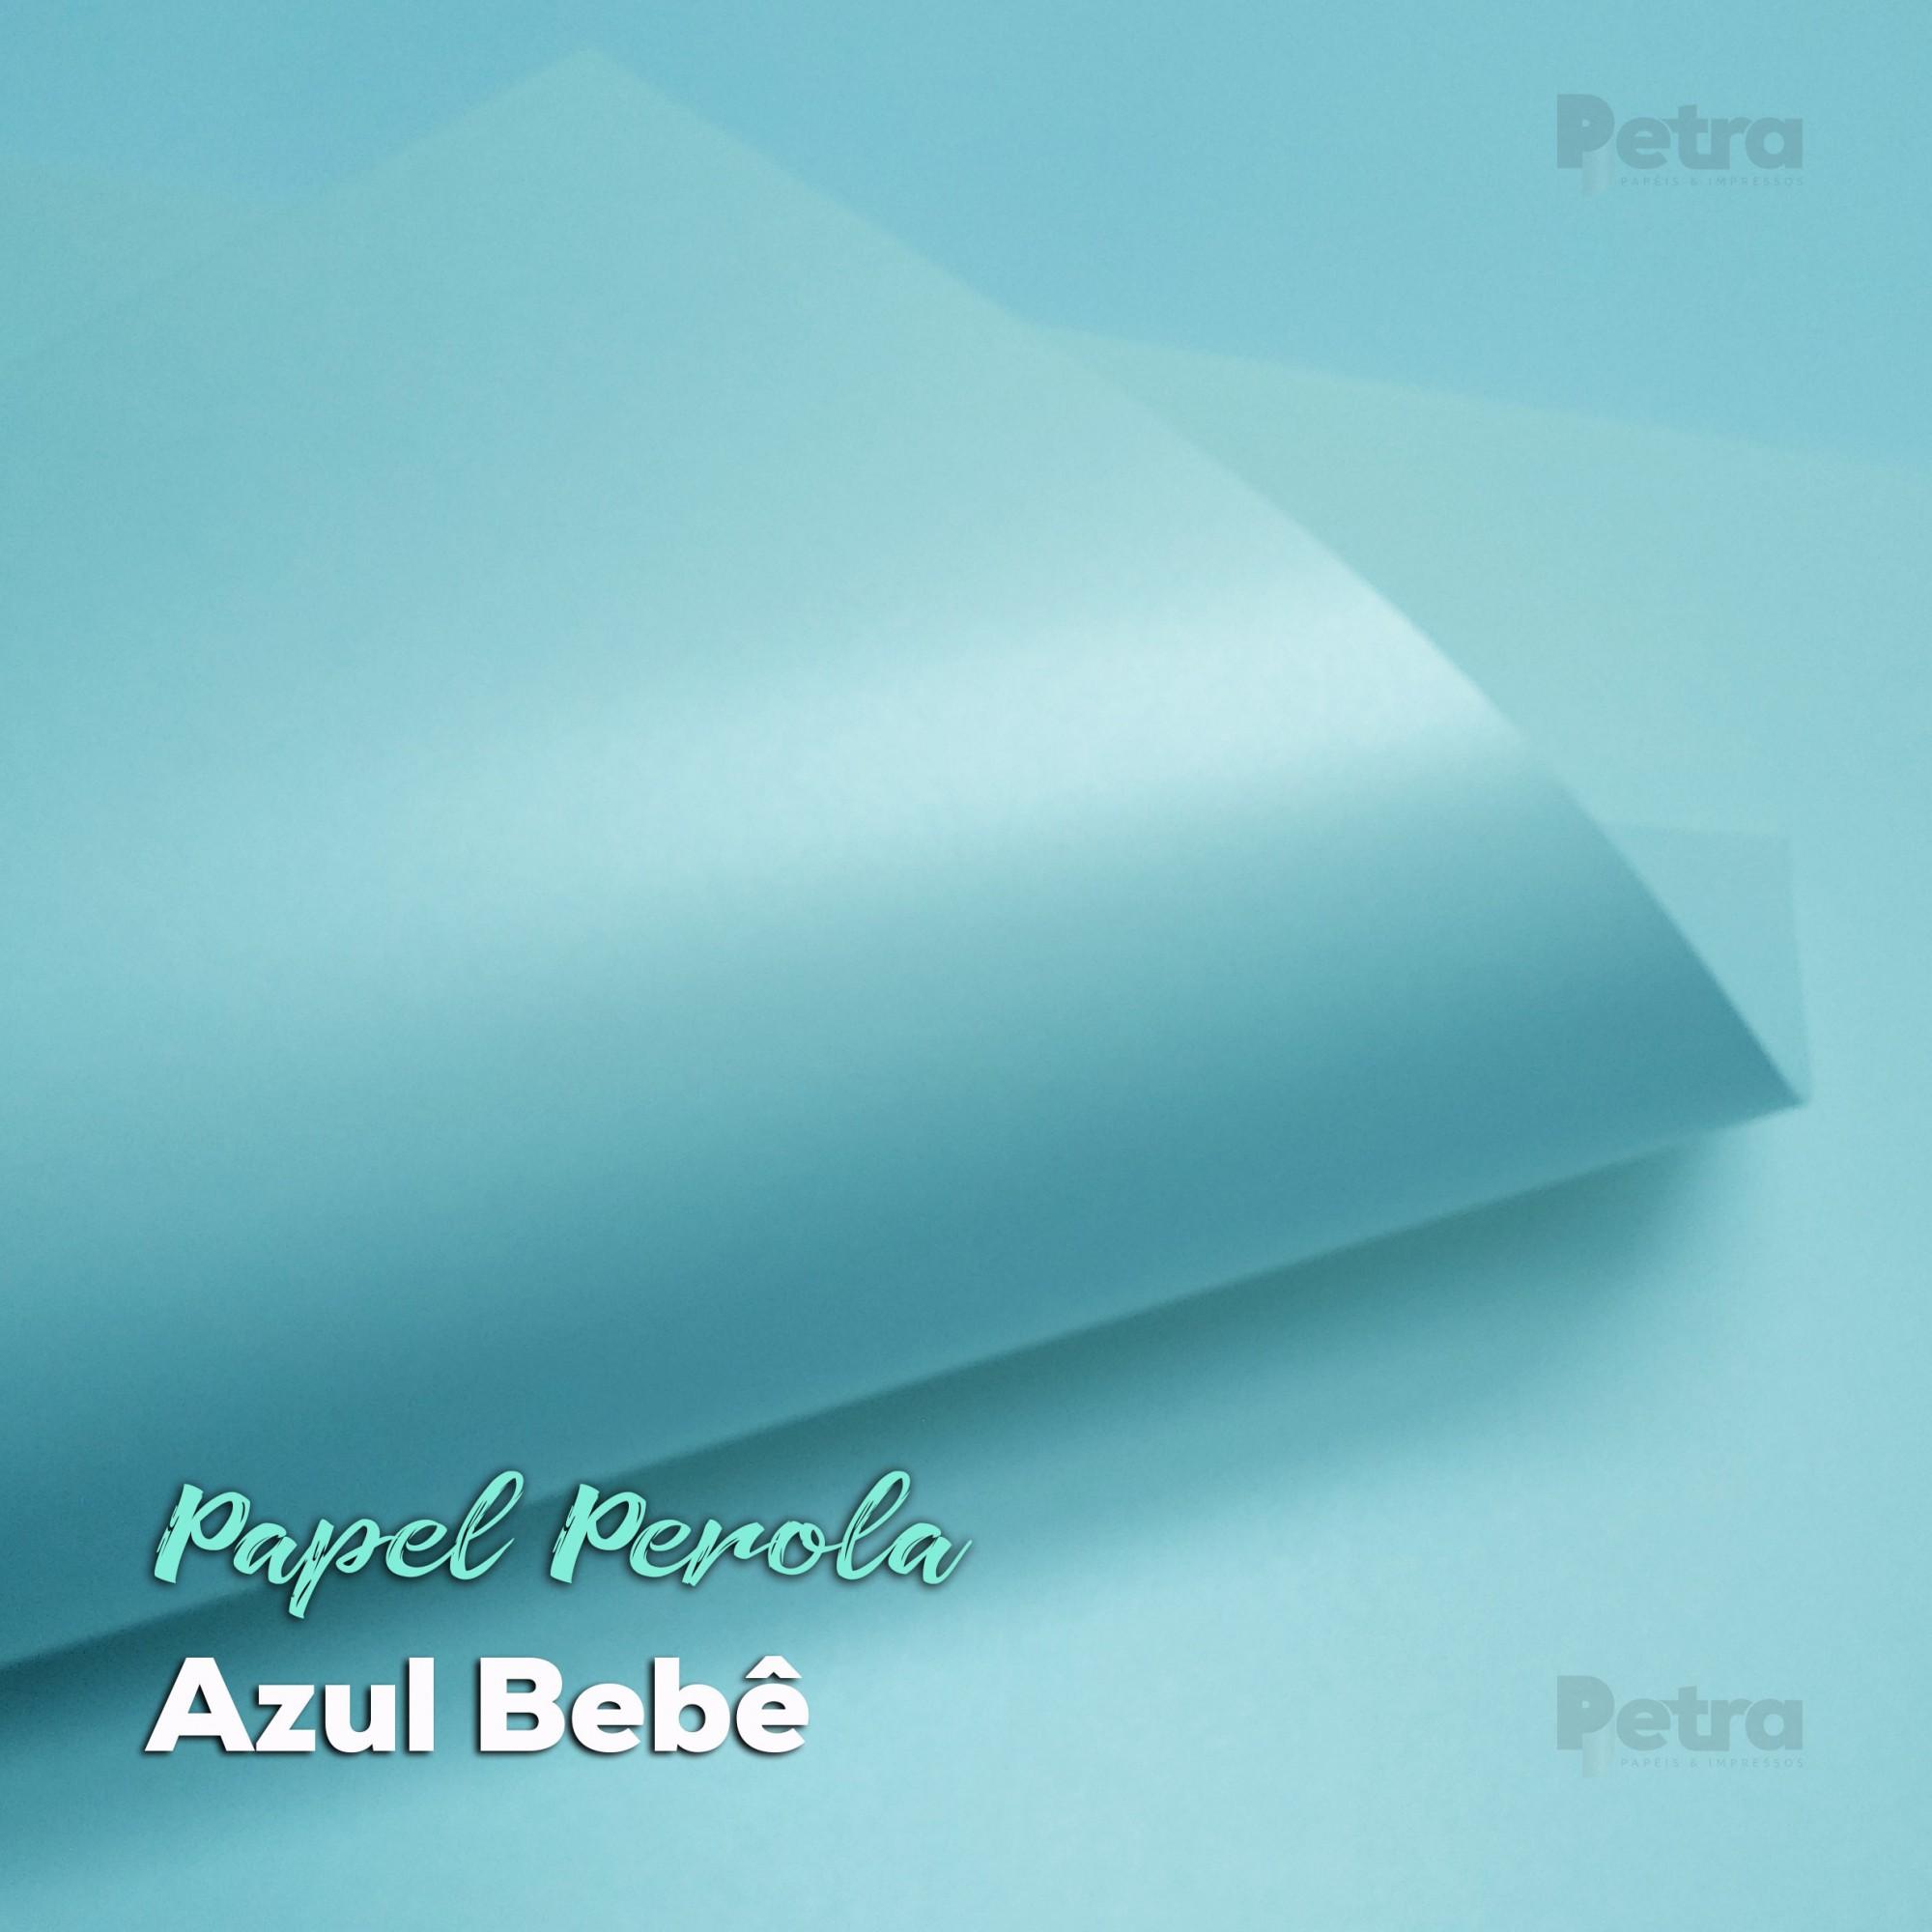 Papel Pérola Azul Bebê Tam: A4 180g/m²